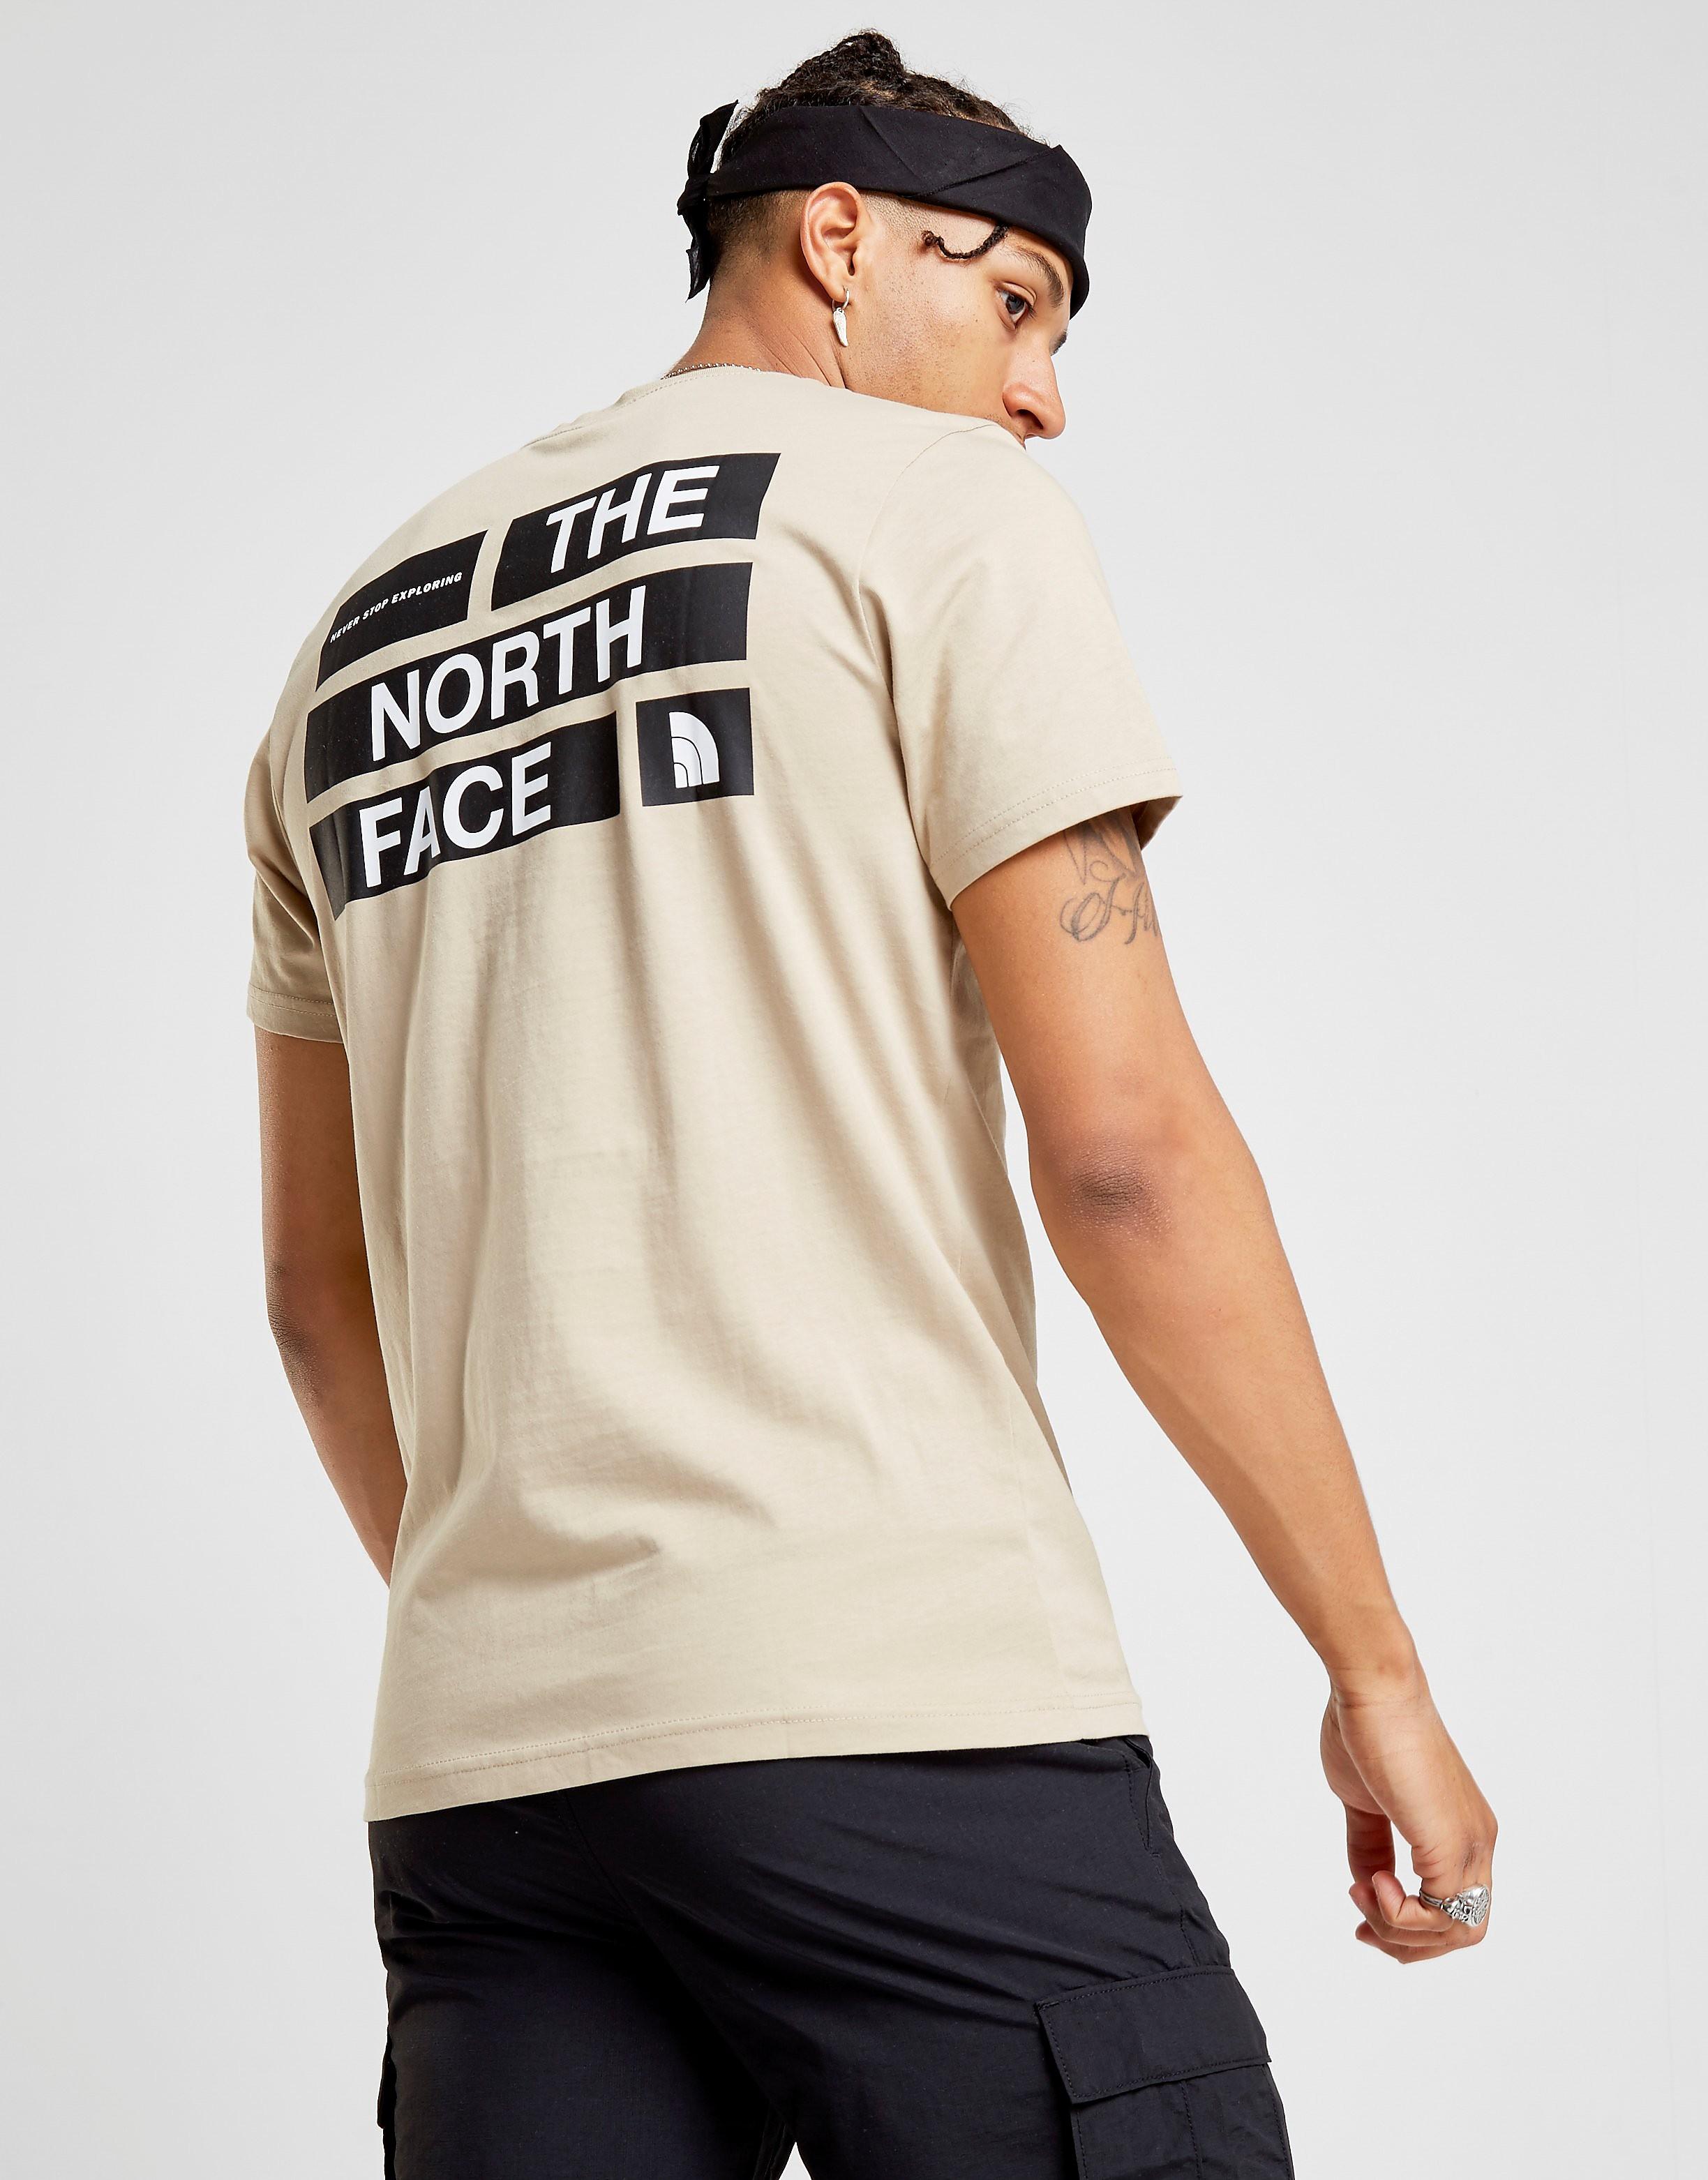 The North Face Newbox 18 T-Shirt